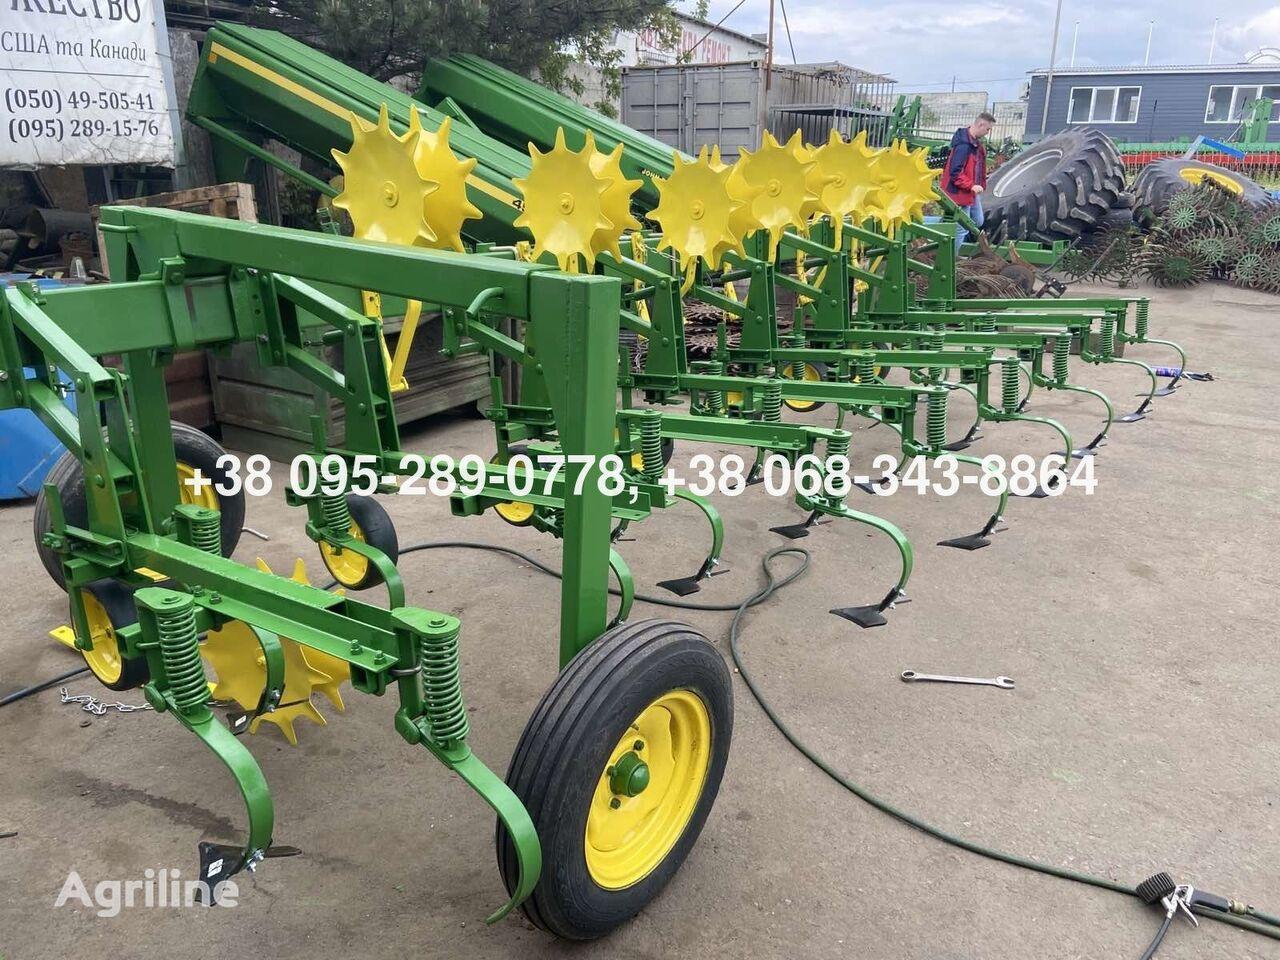 JOHN DEERE 825 cultivador de rastrojo